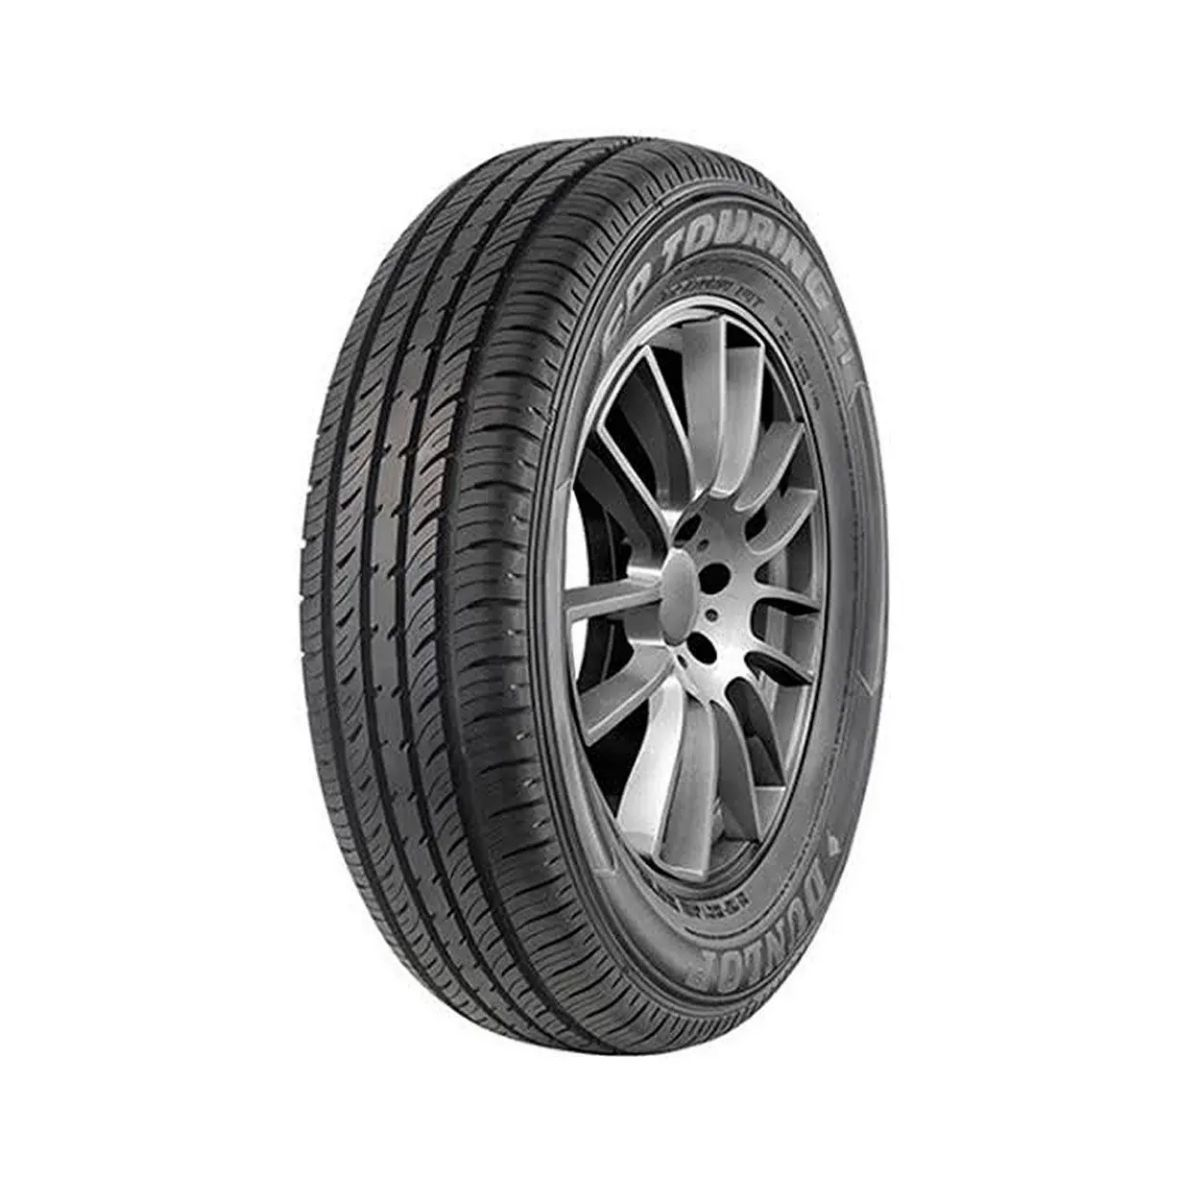 Pneu Dunlop SP Touring T1 Aro 13 165/70R 79T